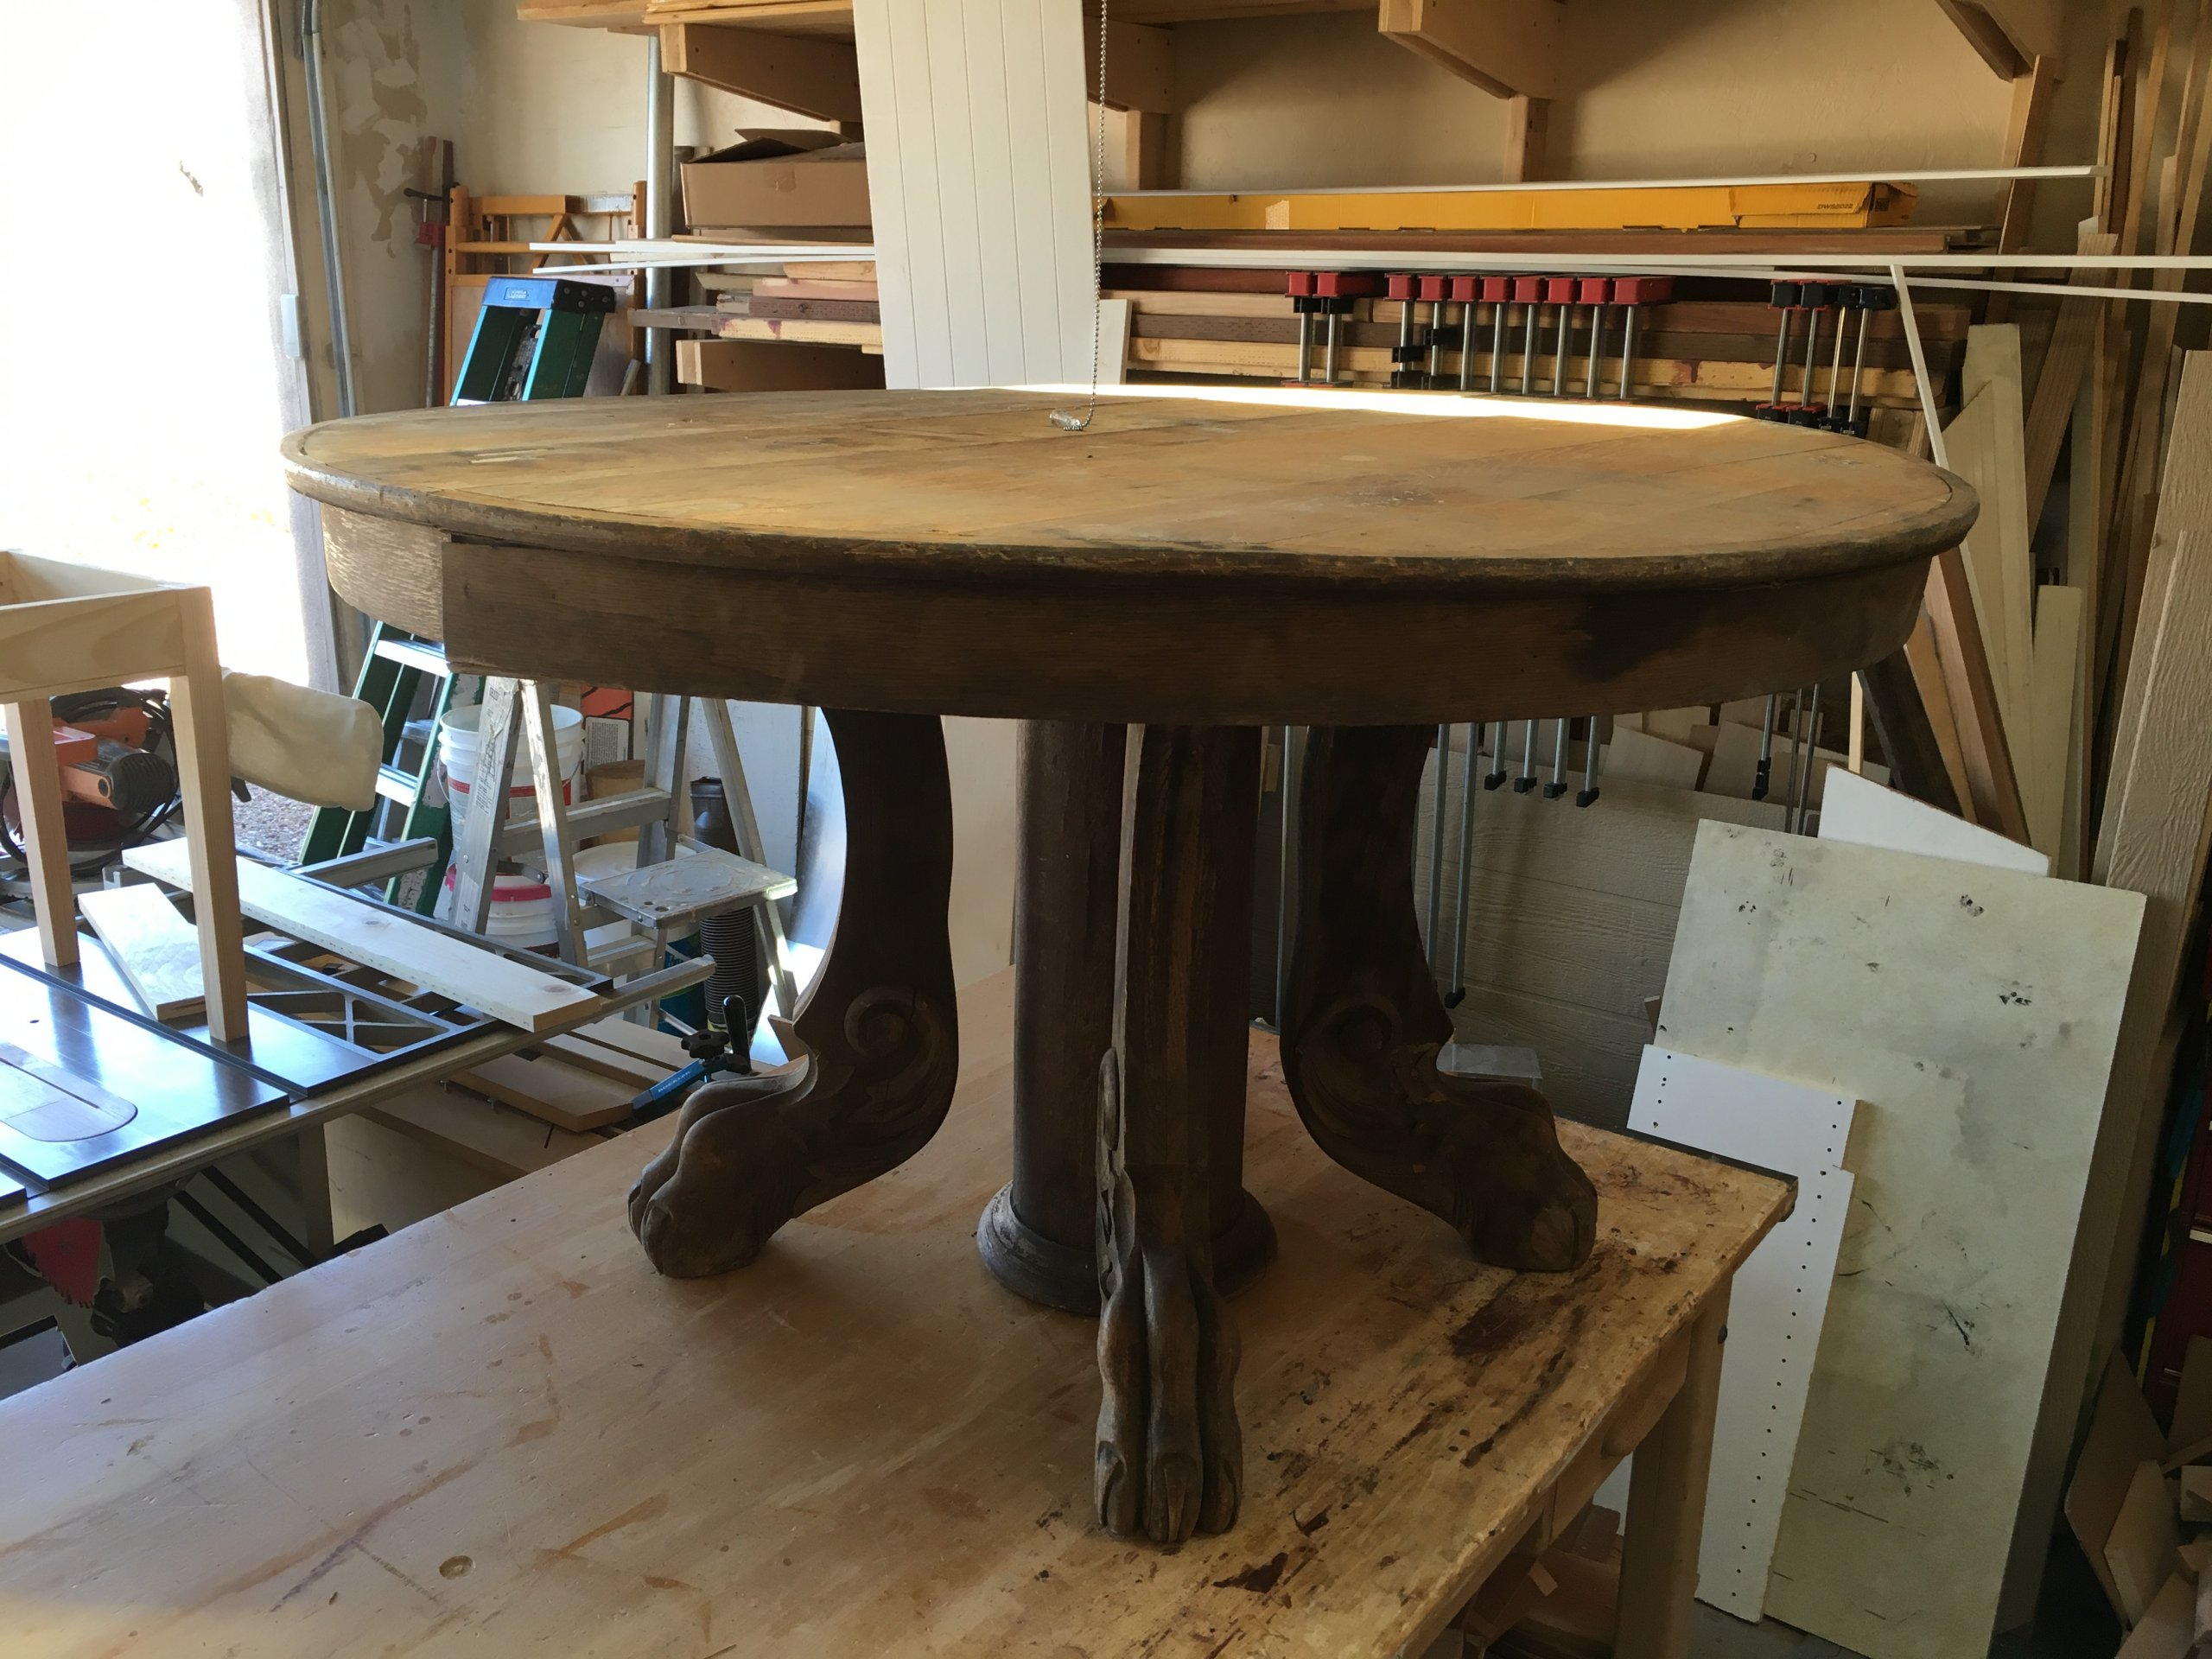 Bobbi's Table - Existing